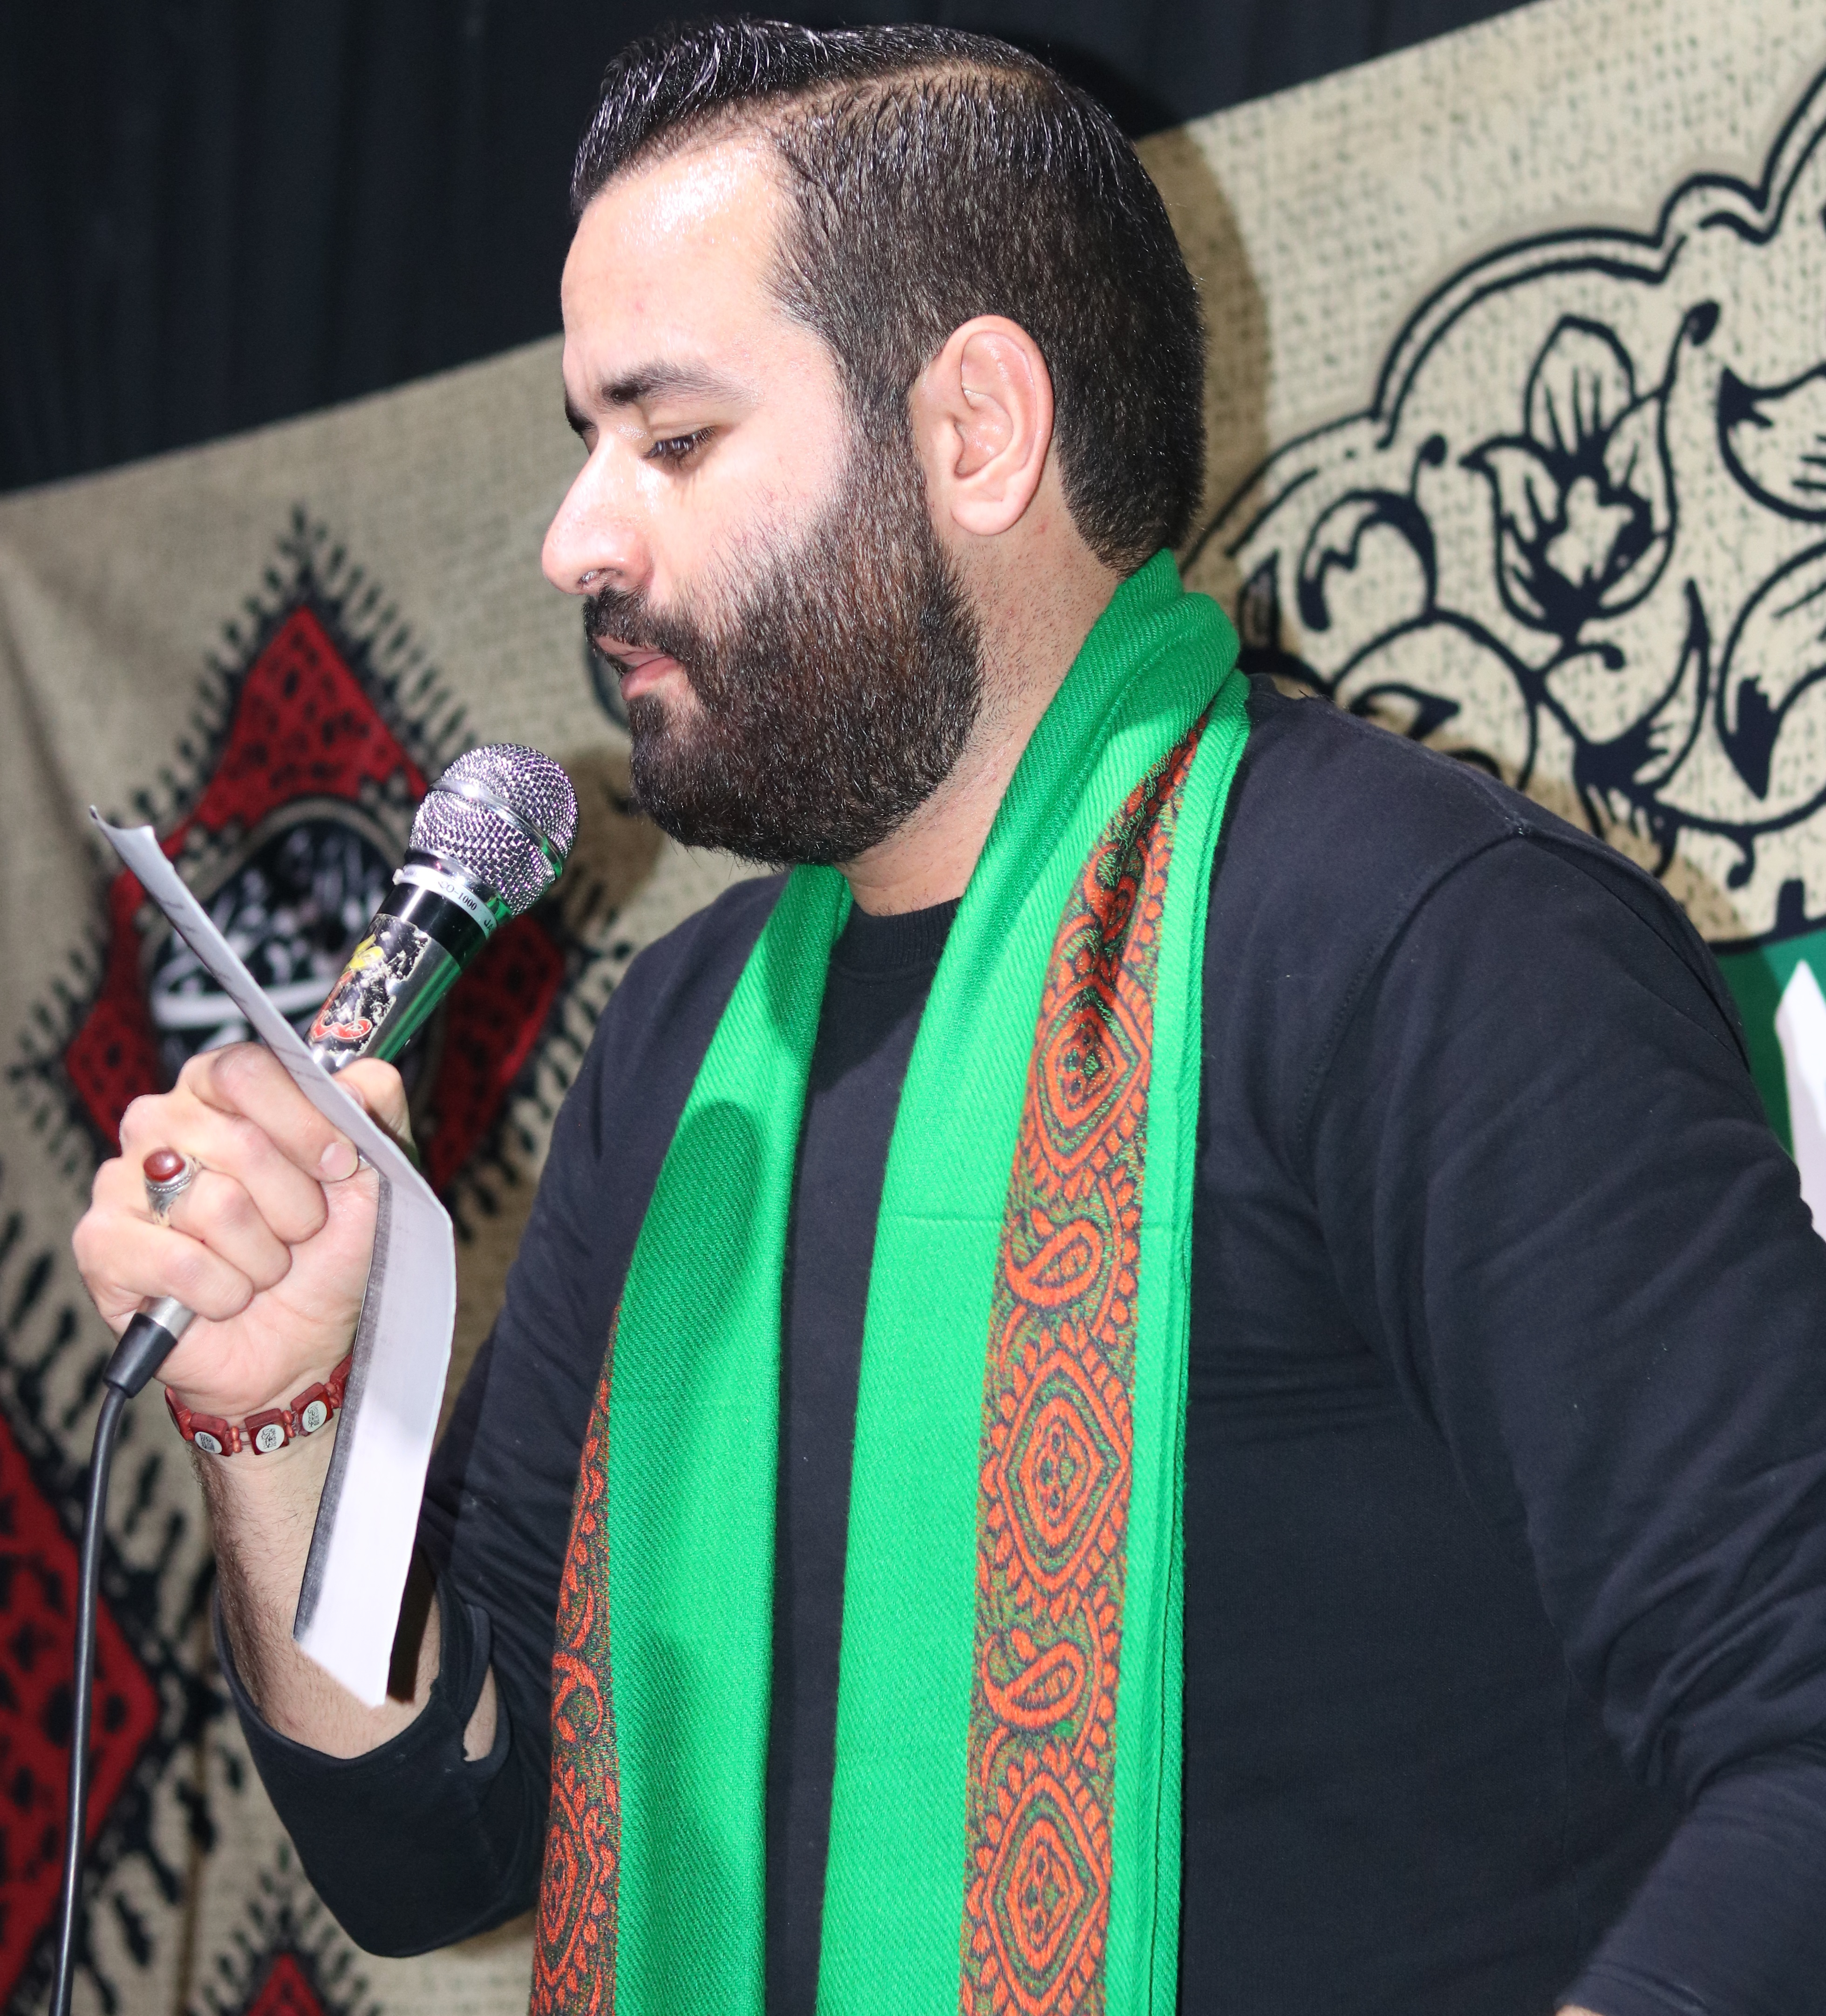 دانلود عکس و والپيپر HD | شهادت حضرت ام کلثوم(س) 23 بهمن 1399